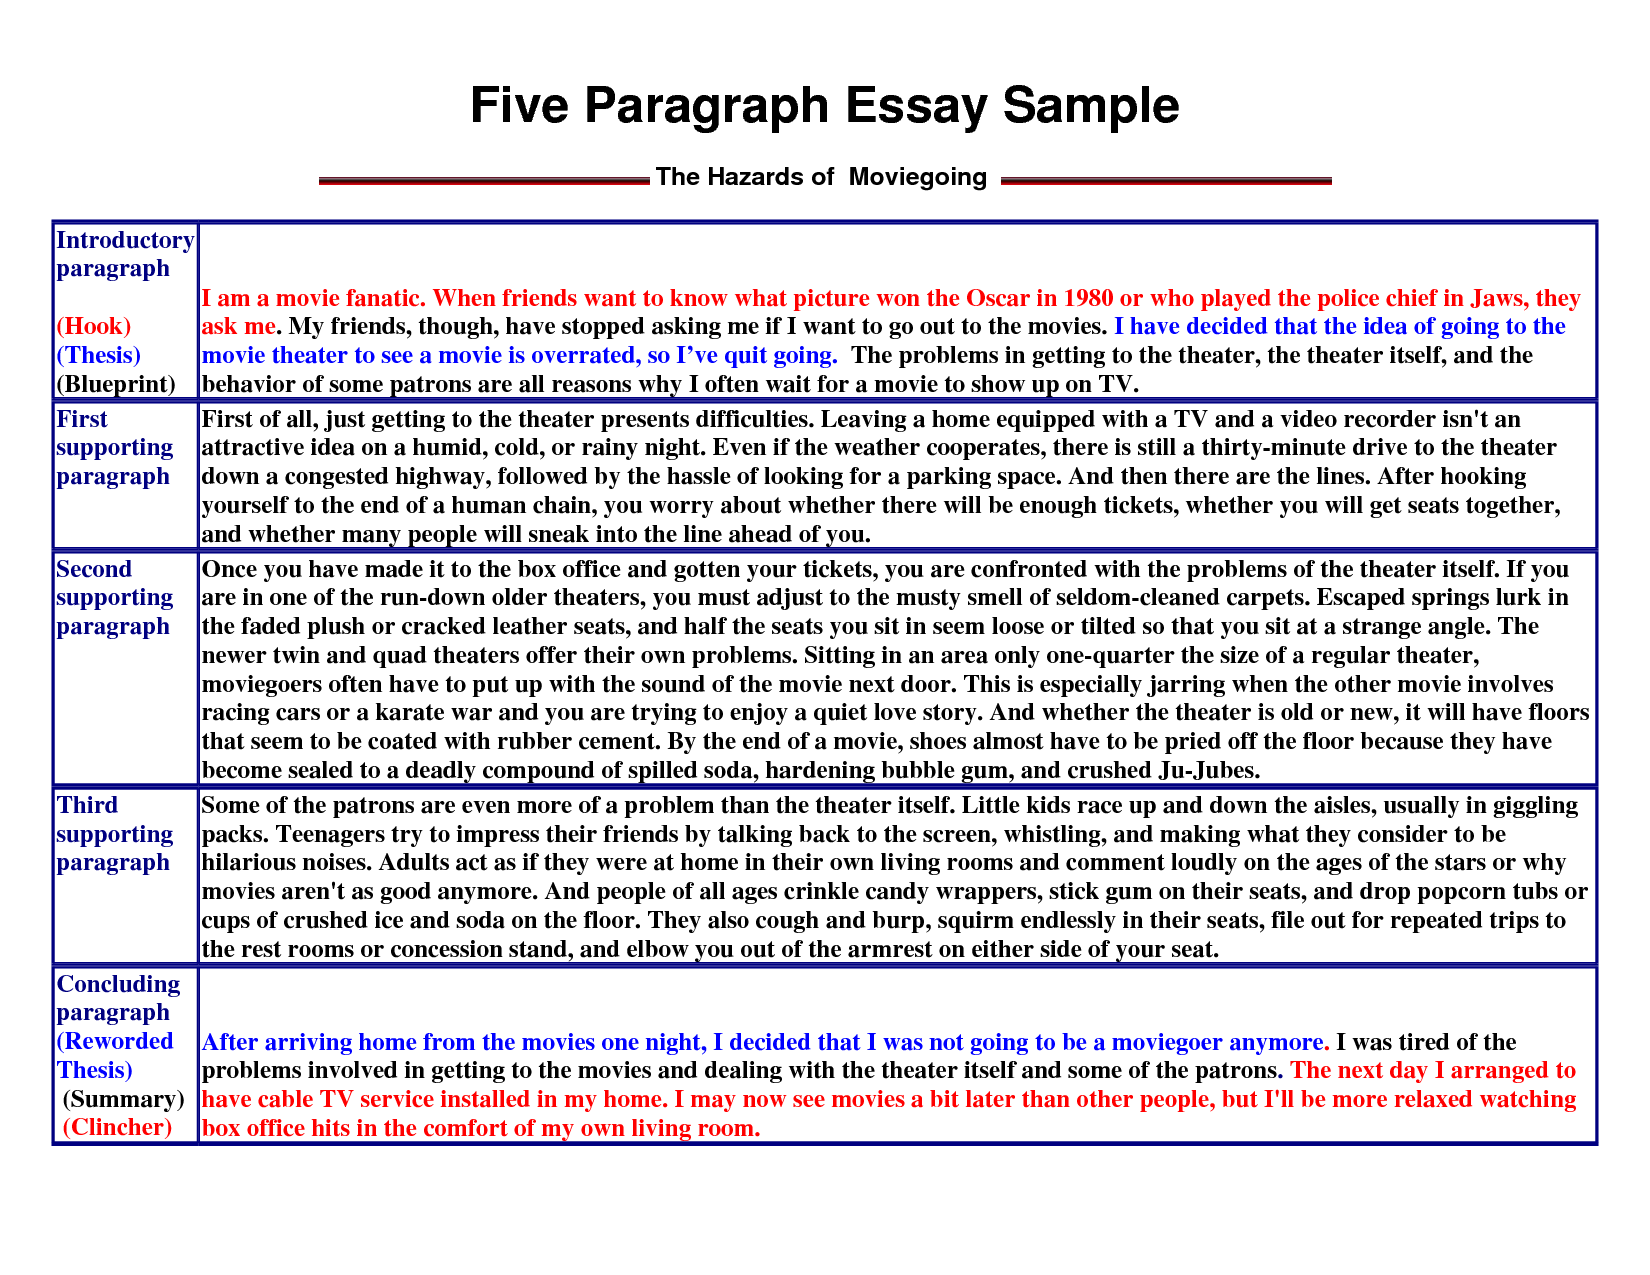 008 Paragraph Essay Sample Example Stirring 5 High School Pdf Argumentative Outline Template Five Full